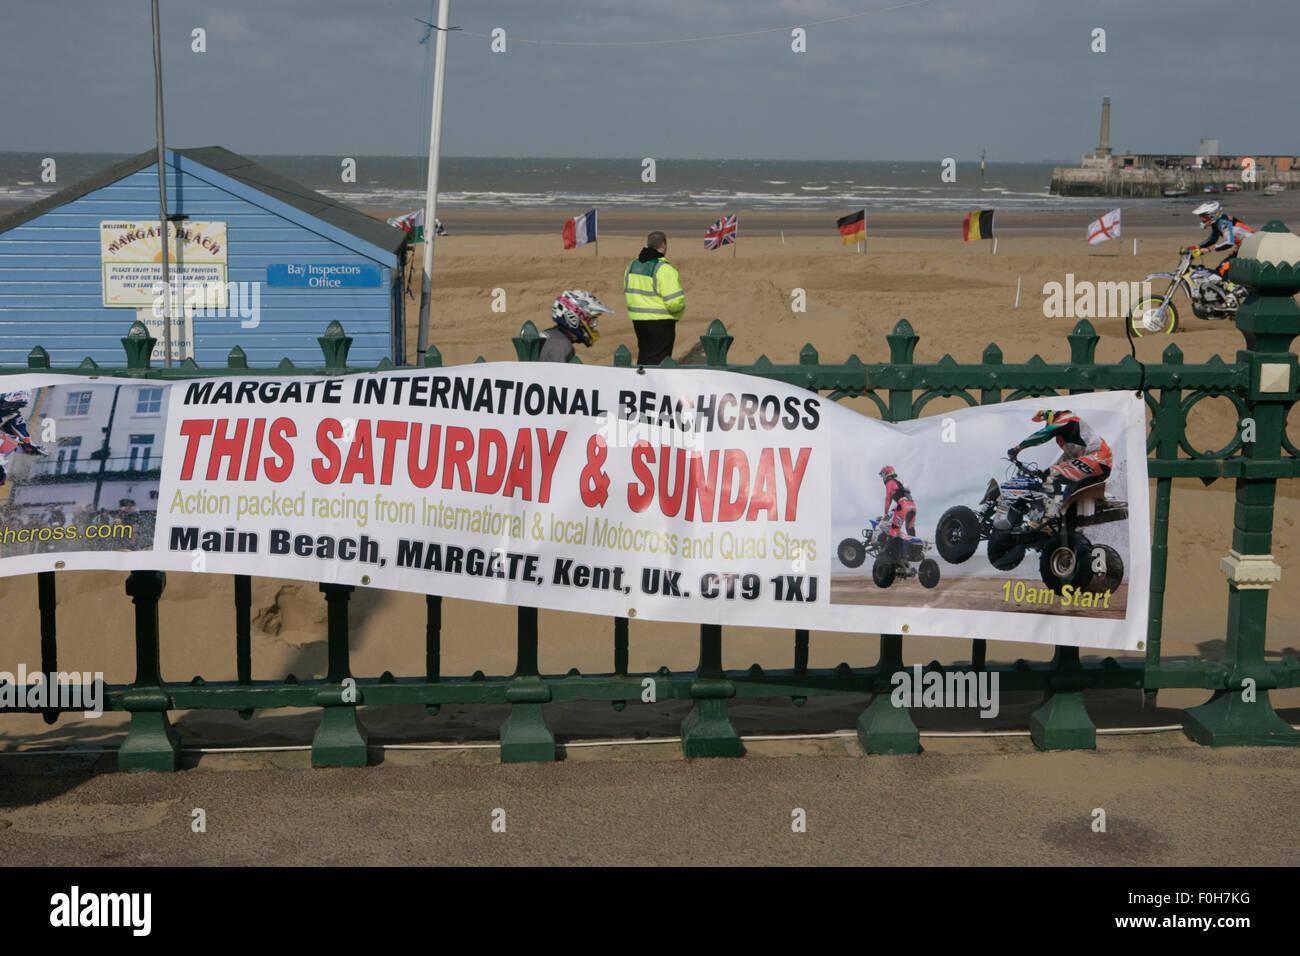 Alternative uses of beach: beachcross, a motorcycle race - Stock Image